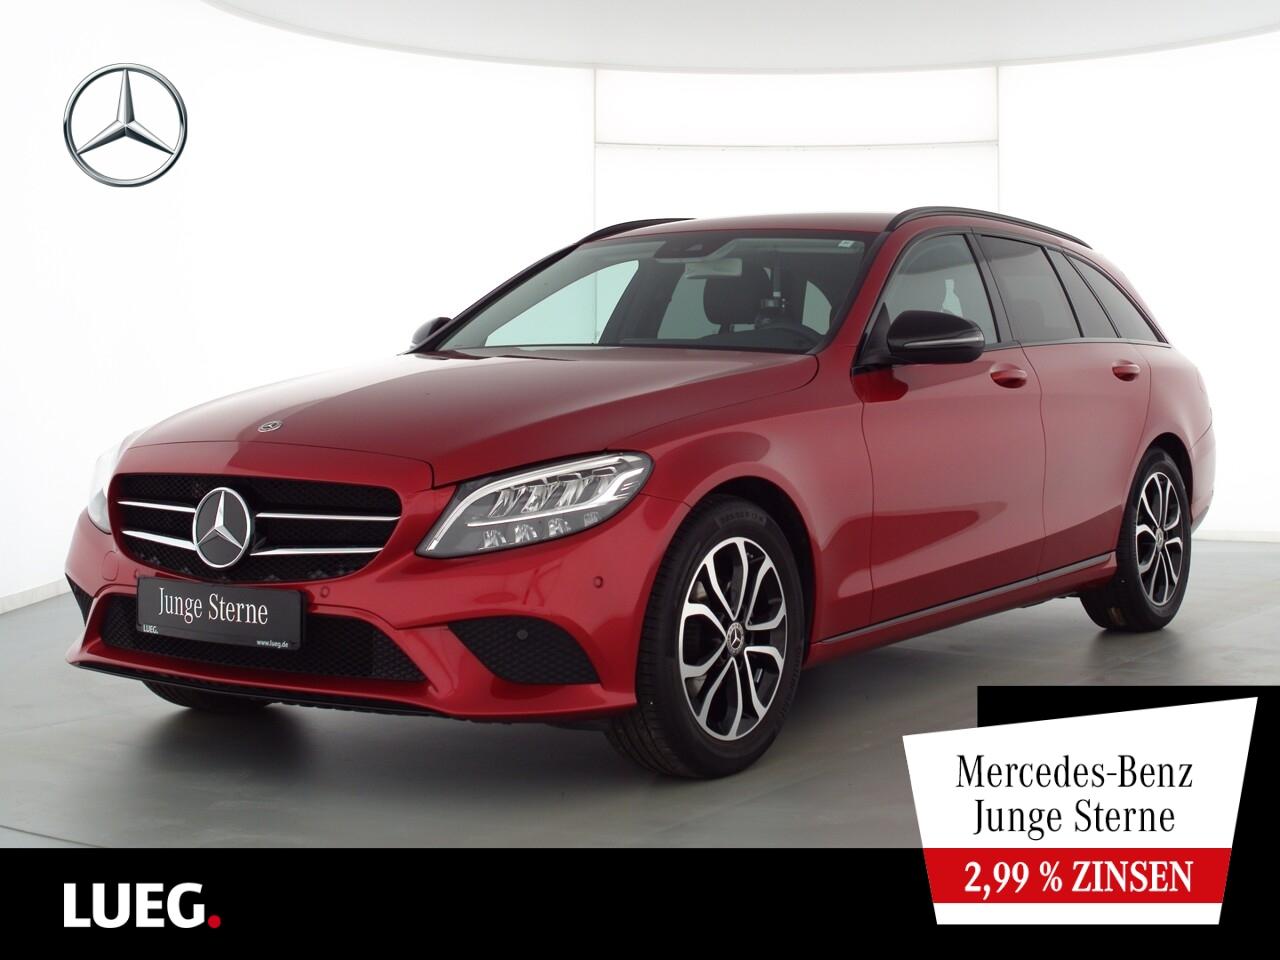 Mercedes-Benz C 180 T Avantgarde+Navi+LED-HP+elHeck+NightP+RFK, Jahr 2019, Benzin